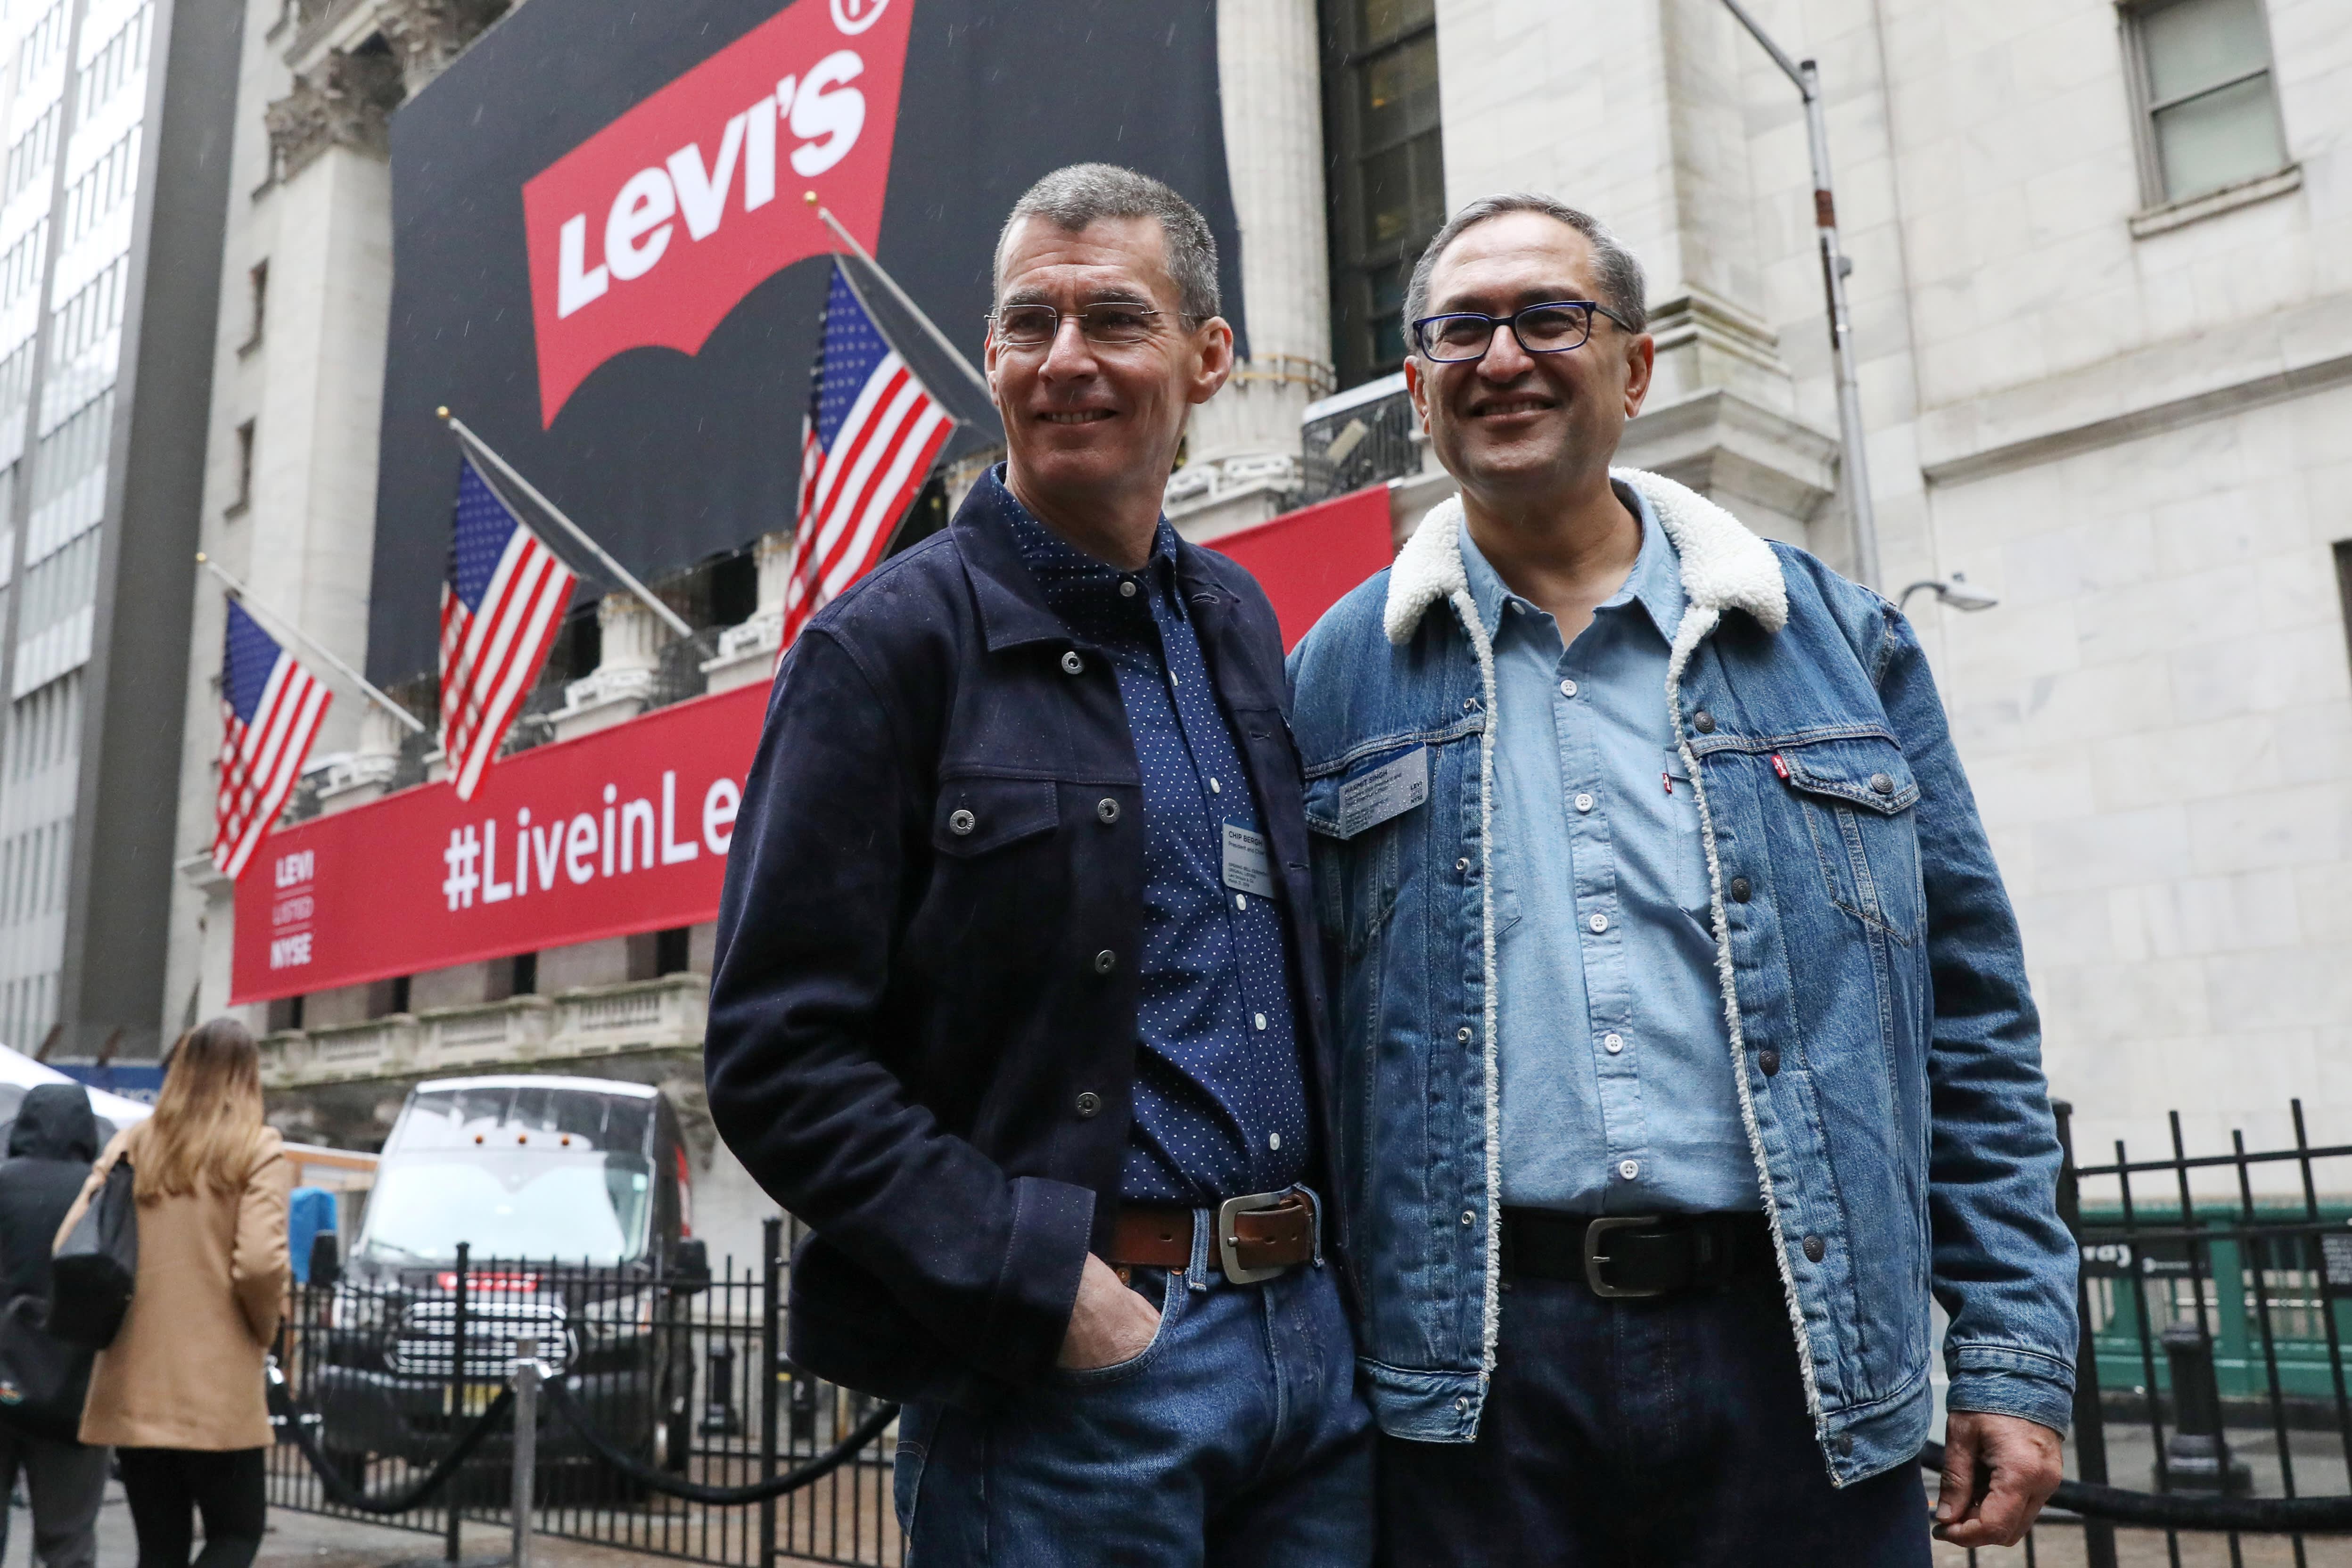 Stocks making the biggest moves in the premarket: Levi Strauss, Apple, Johnson & Johnson & more